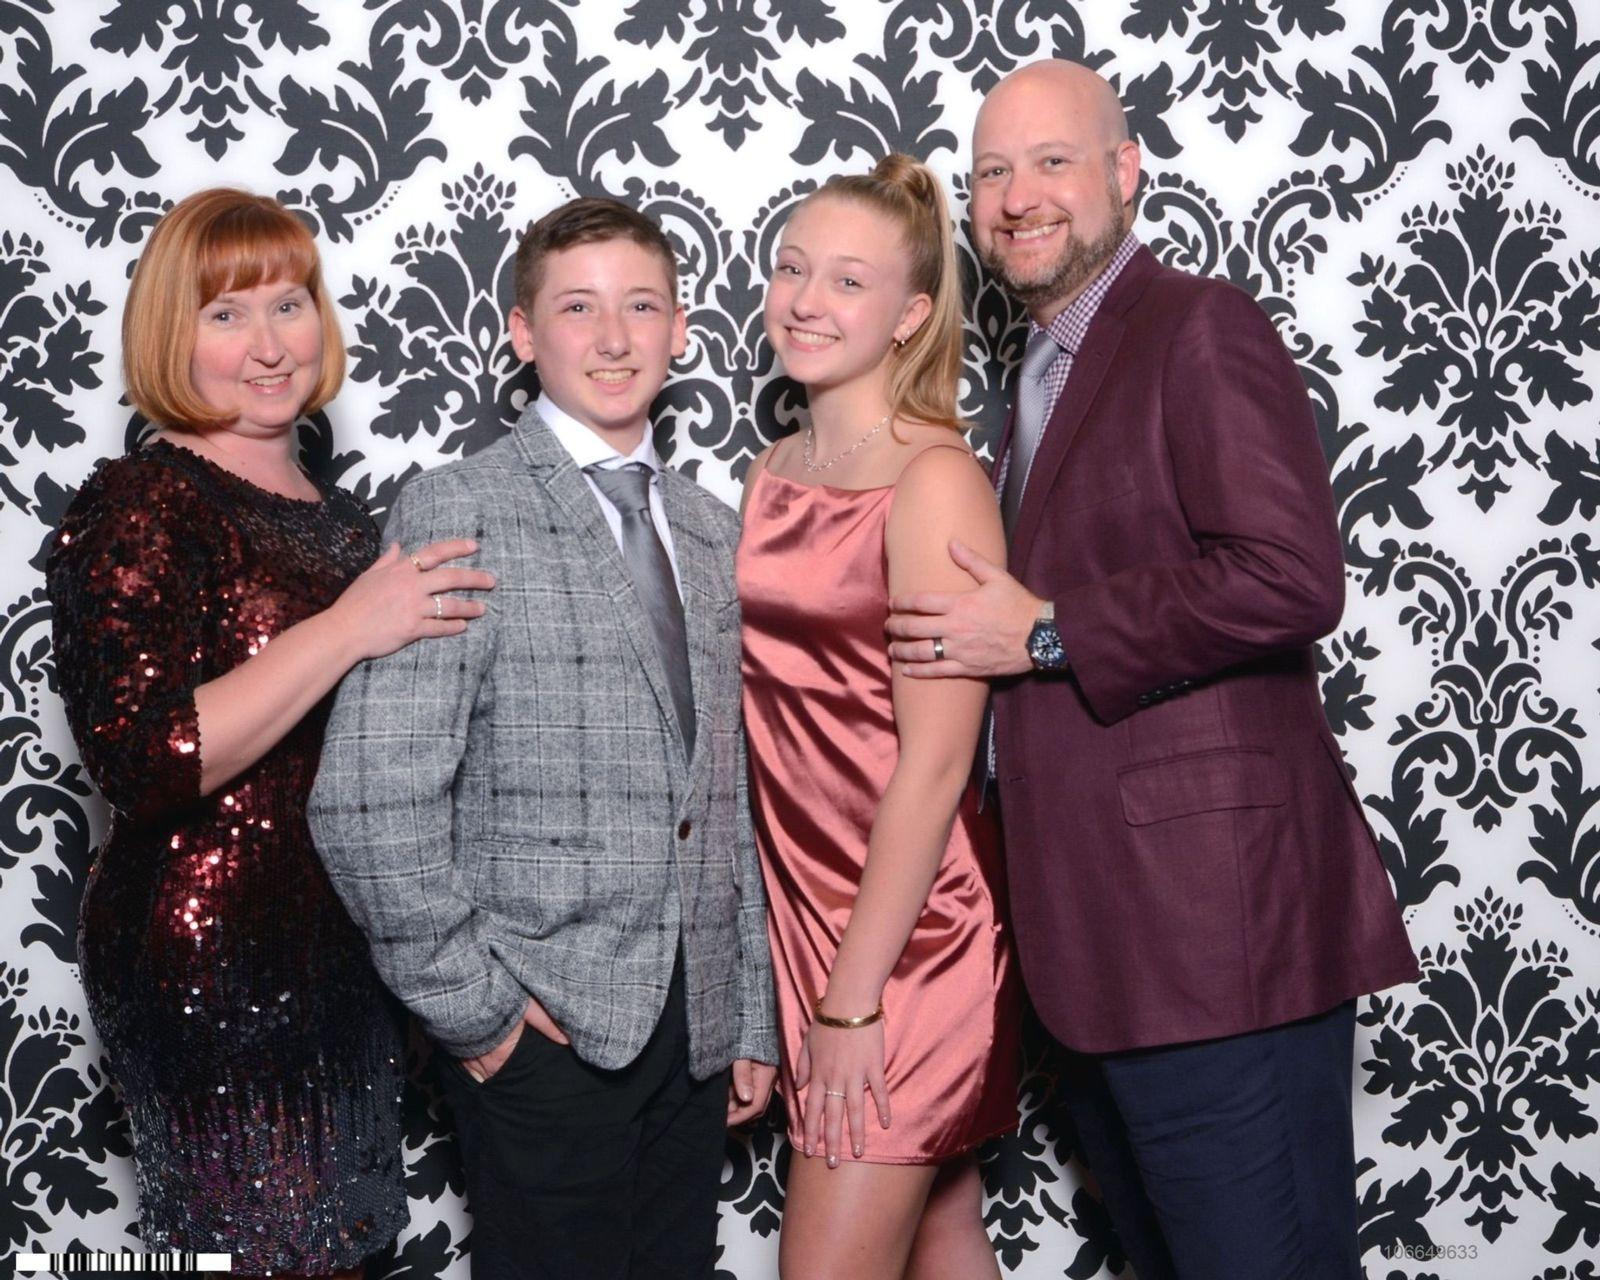 Mikes family